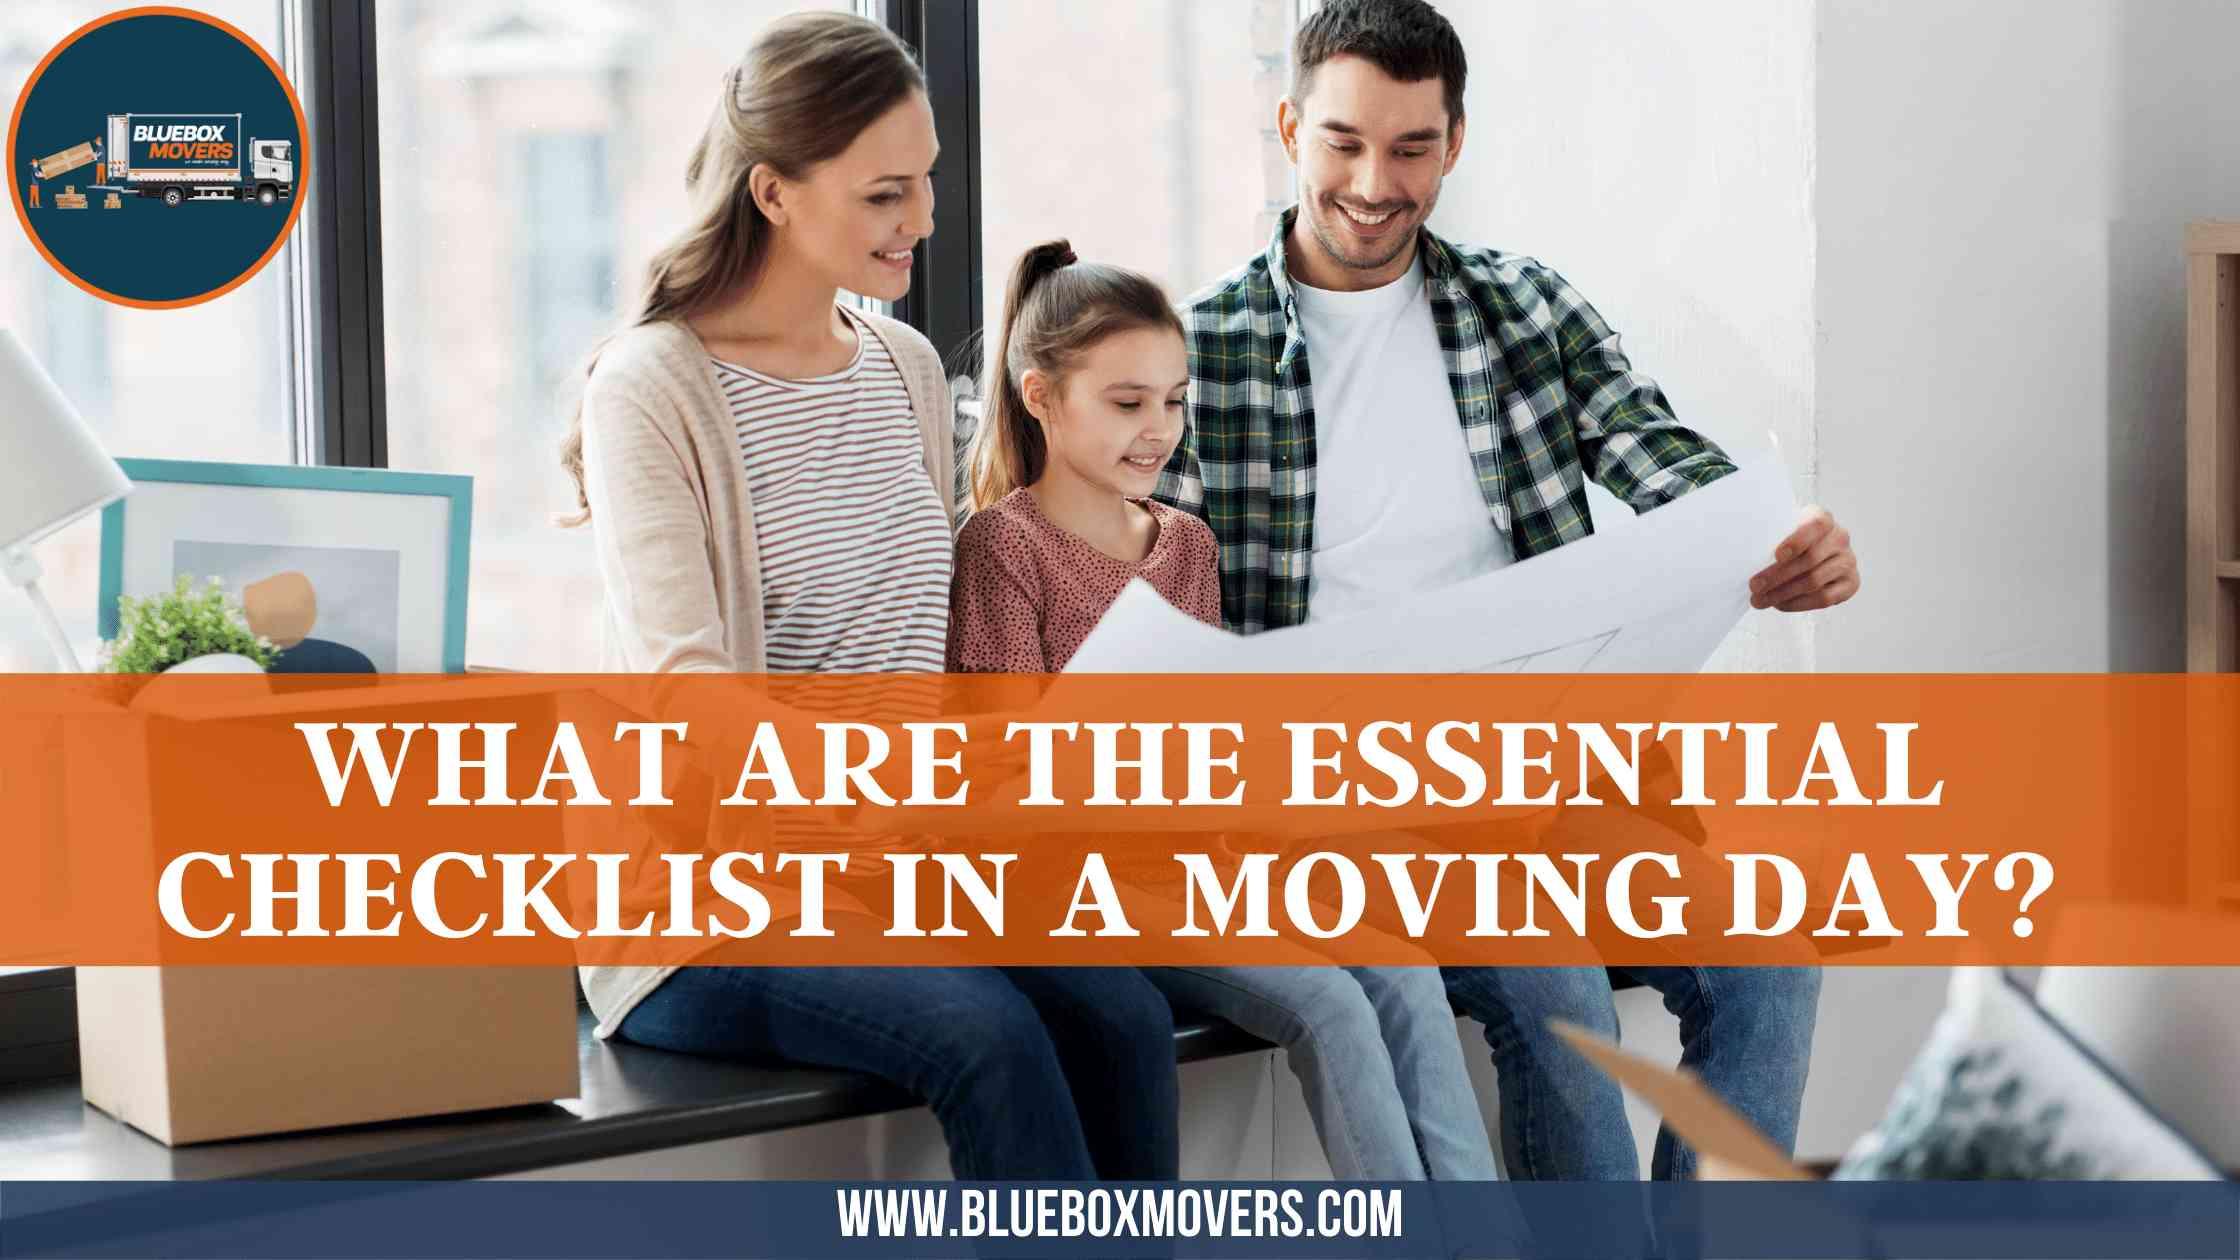 Essentoal Checklist